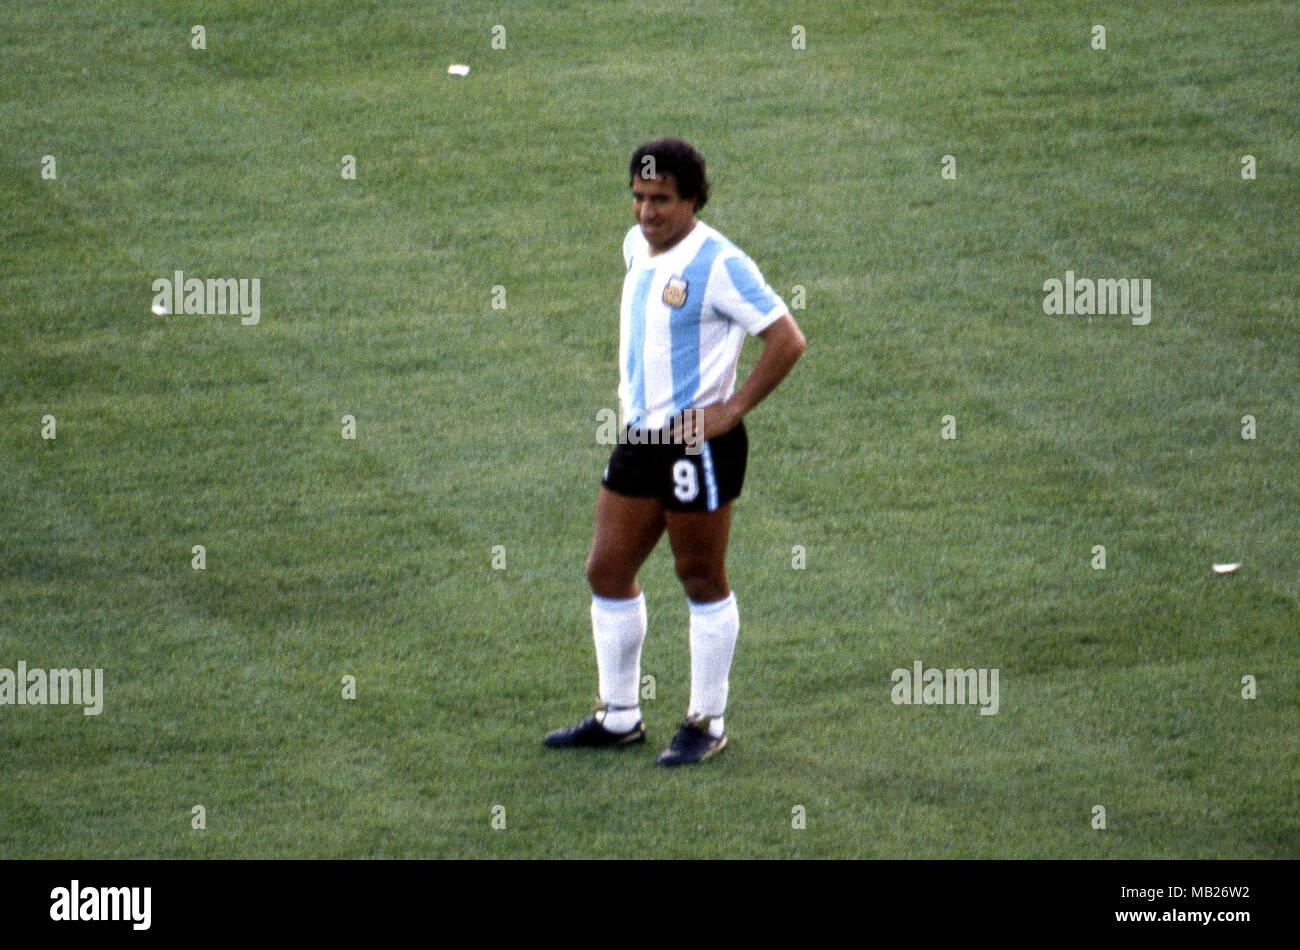 Fifa Wm Espana 1982 Spanien 1982 18061982 Estadio José Rico